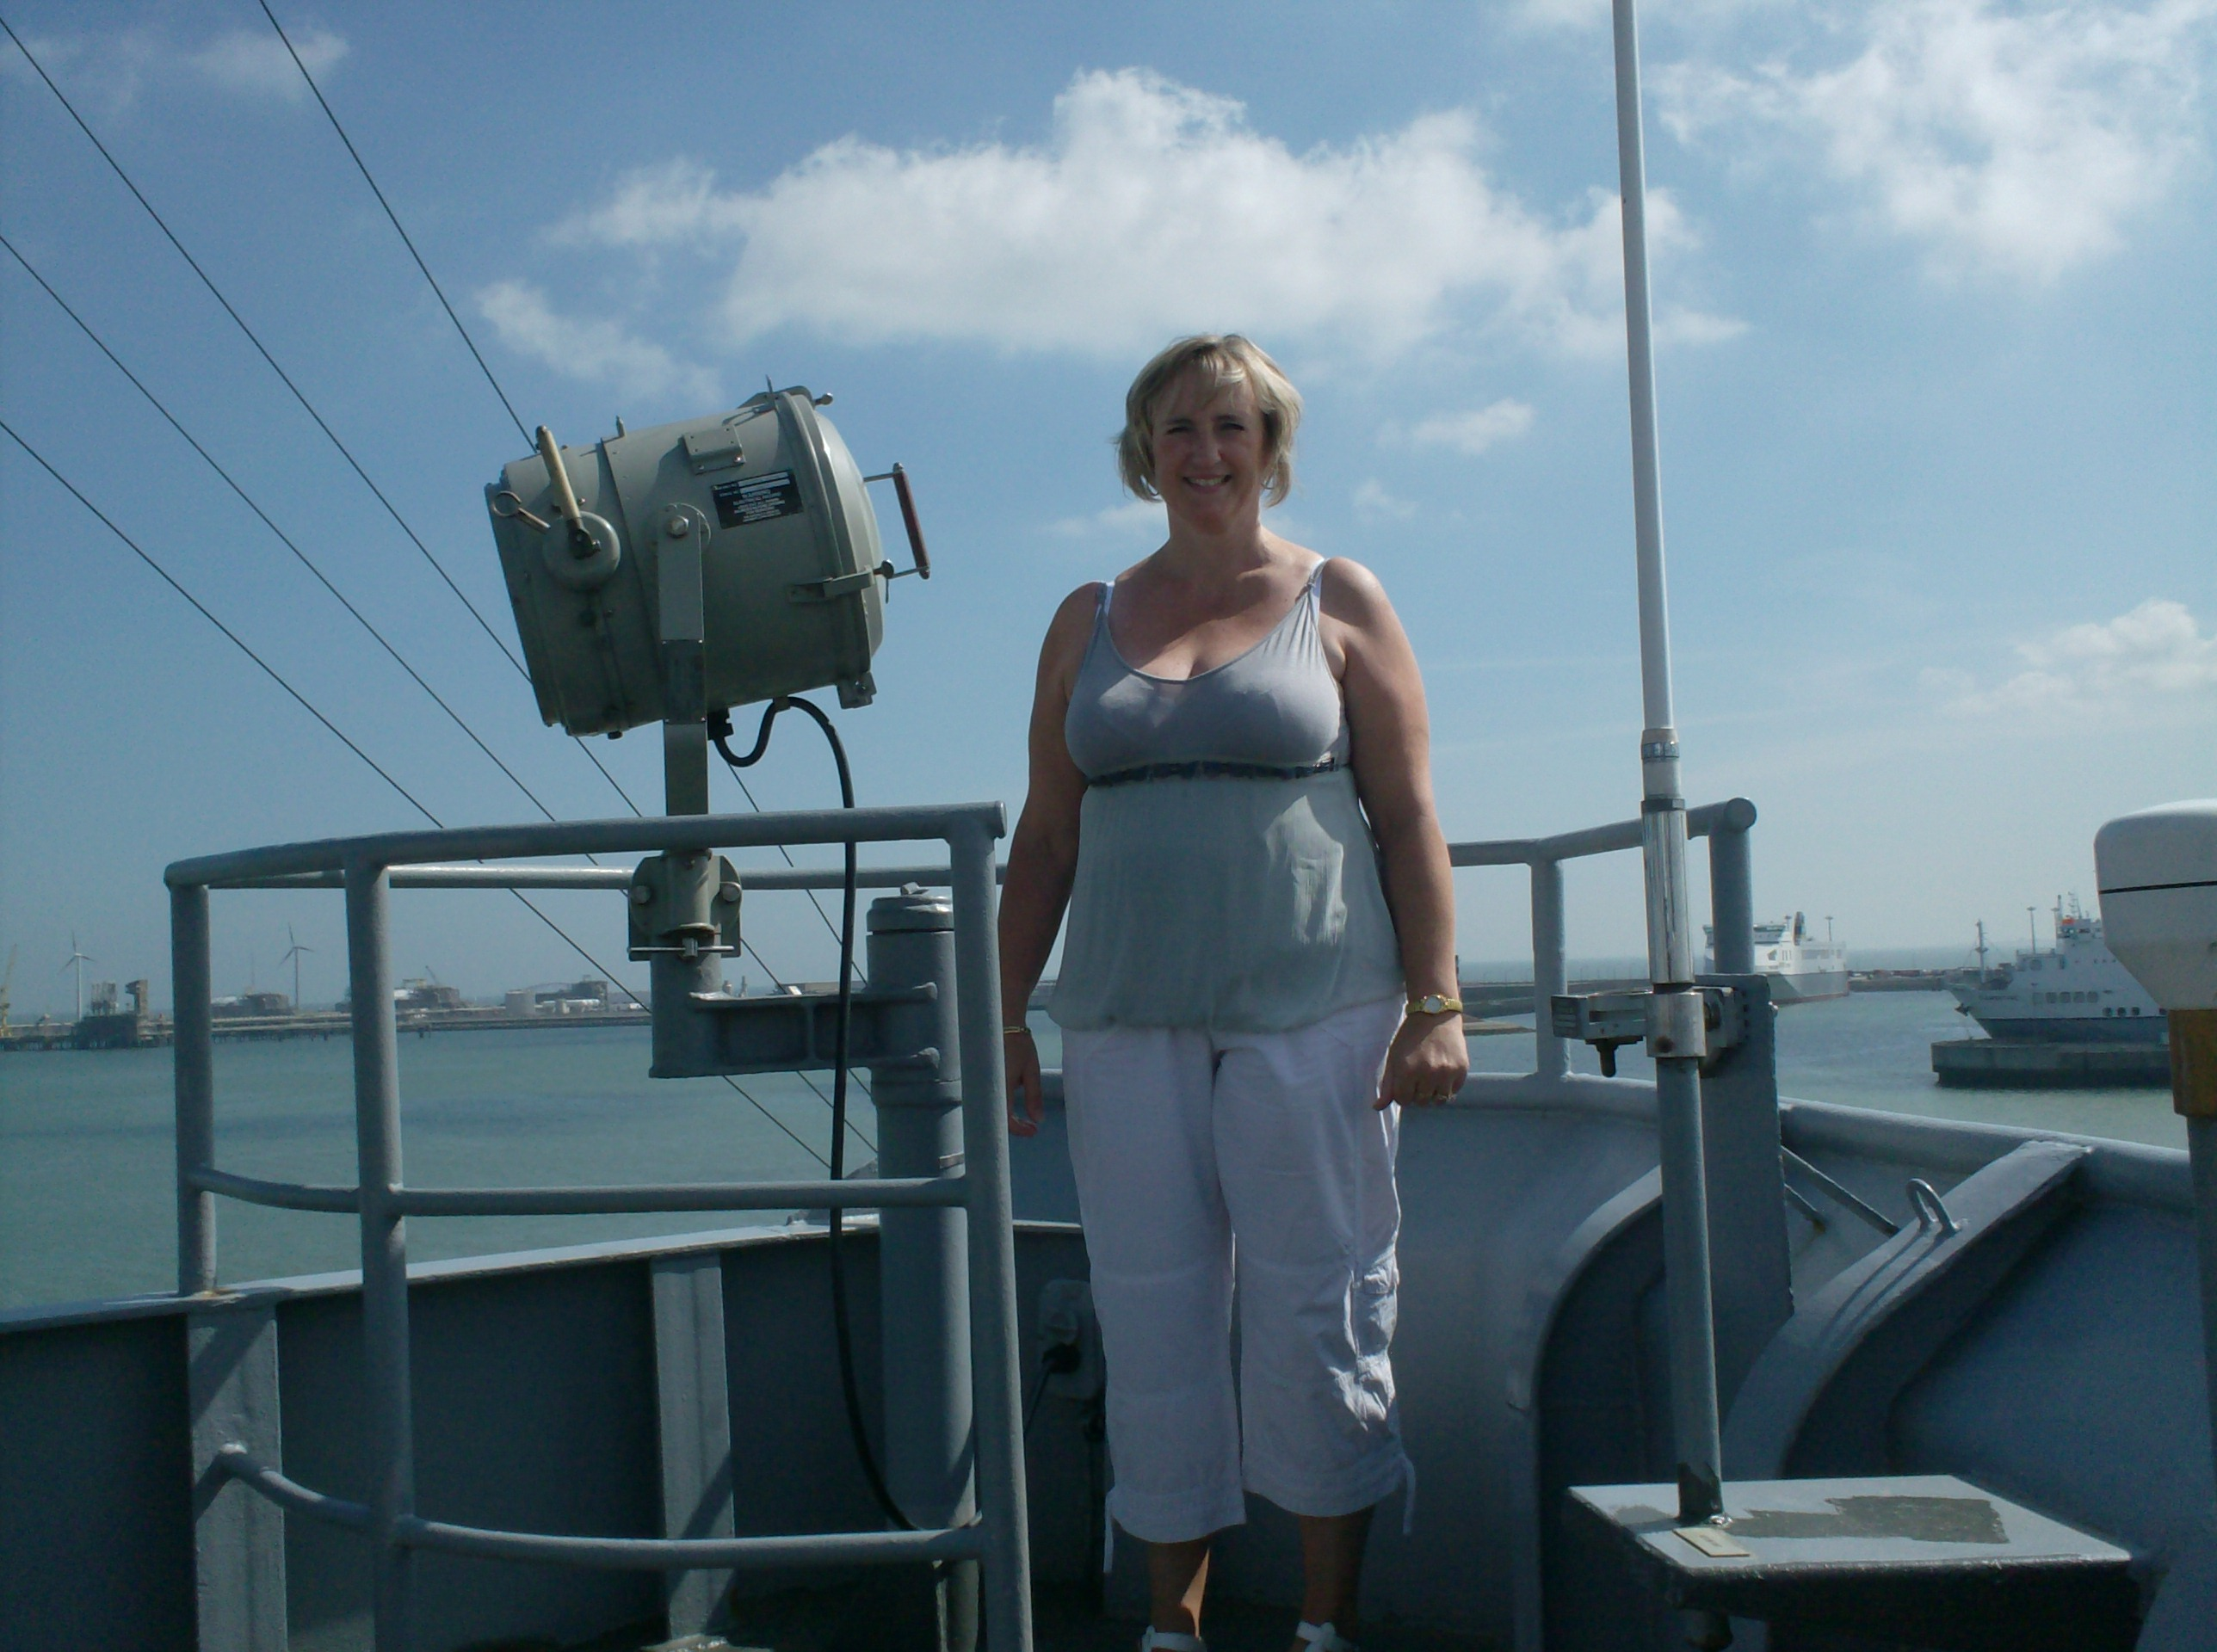 Vos photos du Navy Day 03&04/07/2010  - Page 2 897626HPIM1442